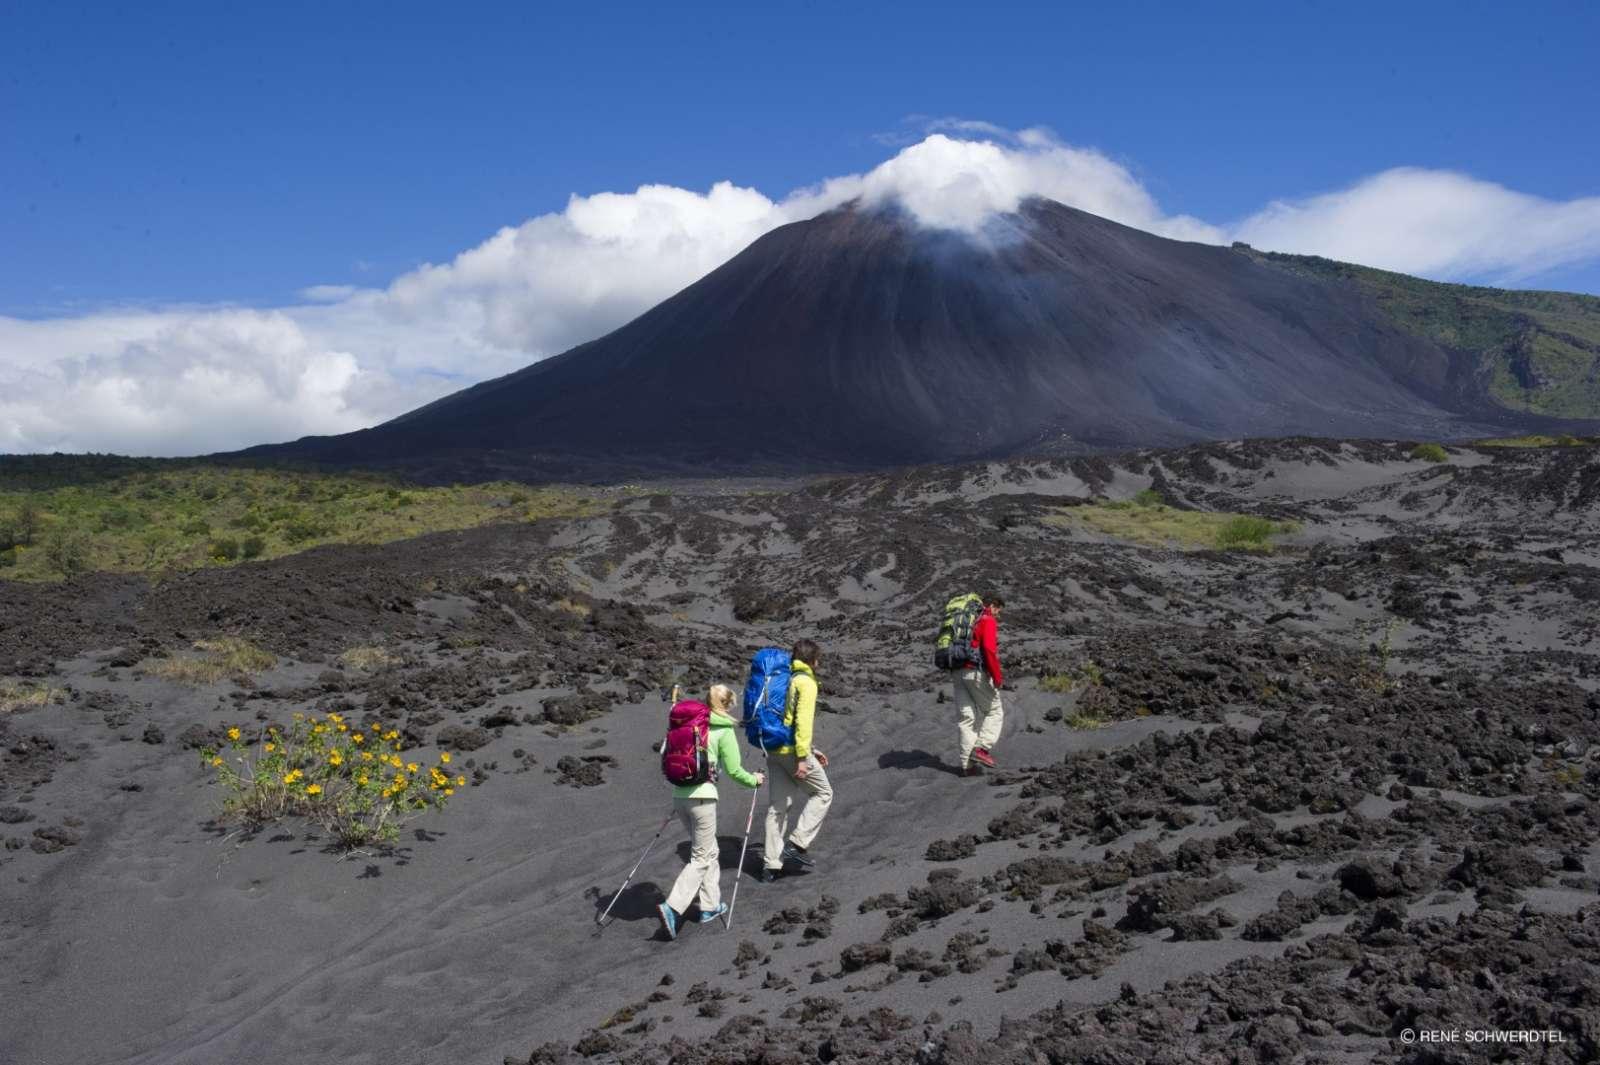 Hiking Mount Pacaya volcano near Antigua, Guatemala